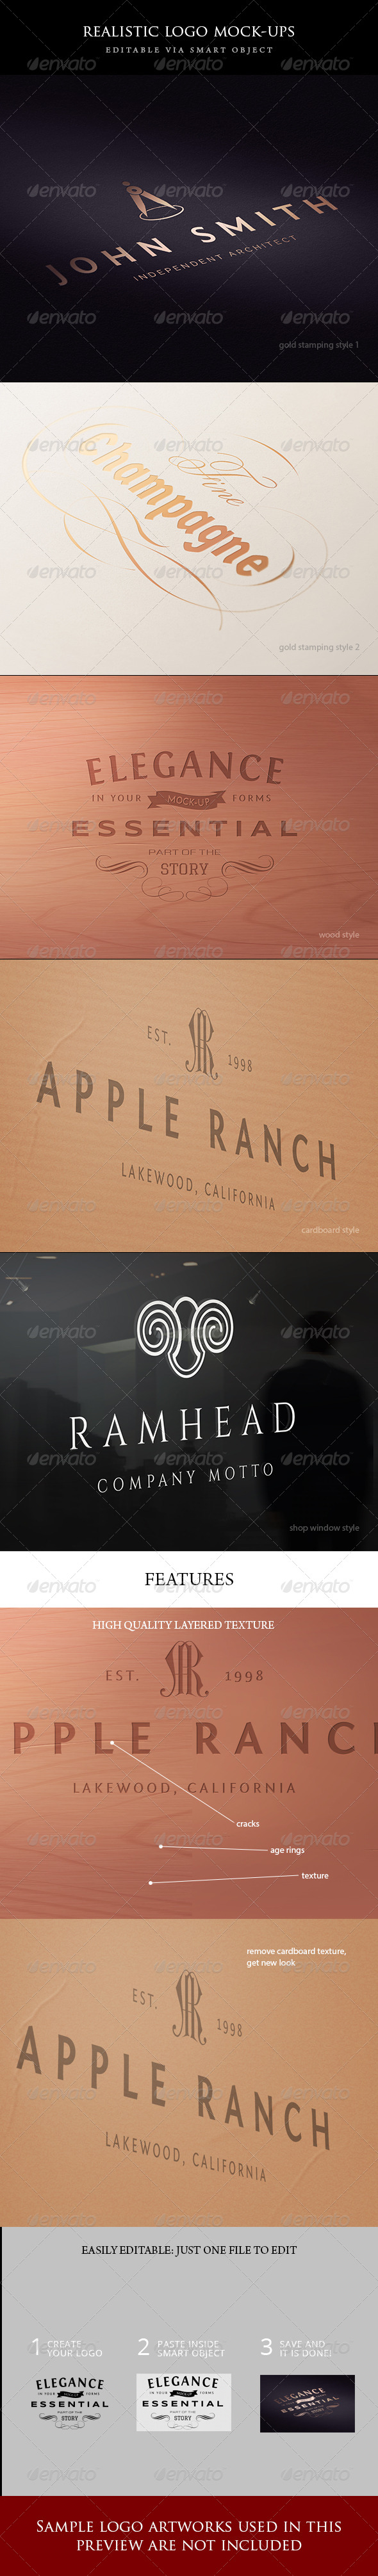 GraphicRiver 5 logo mock-ups 5211248